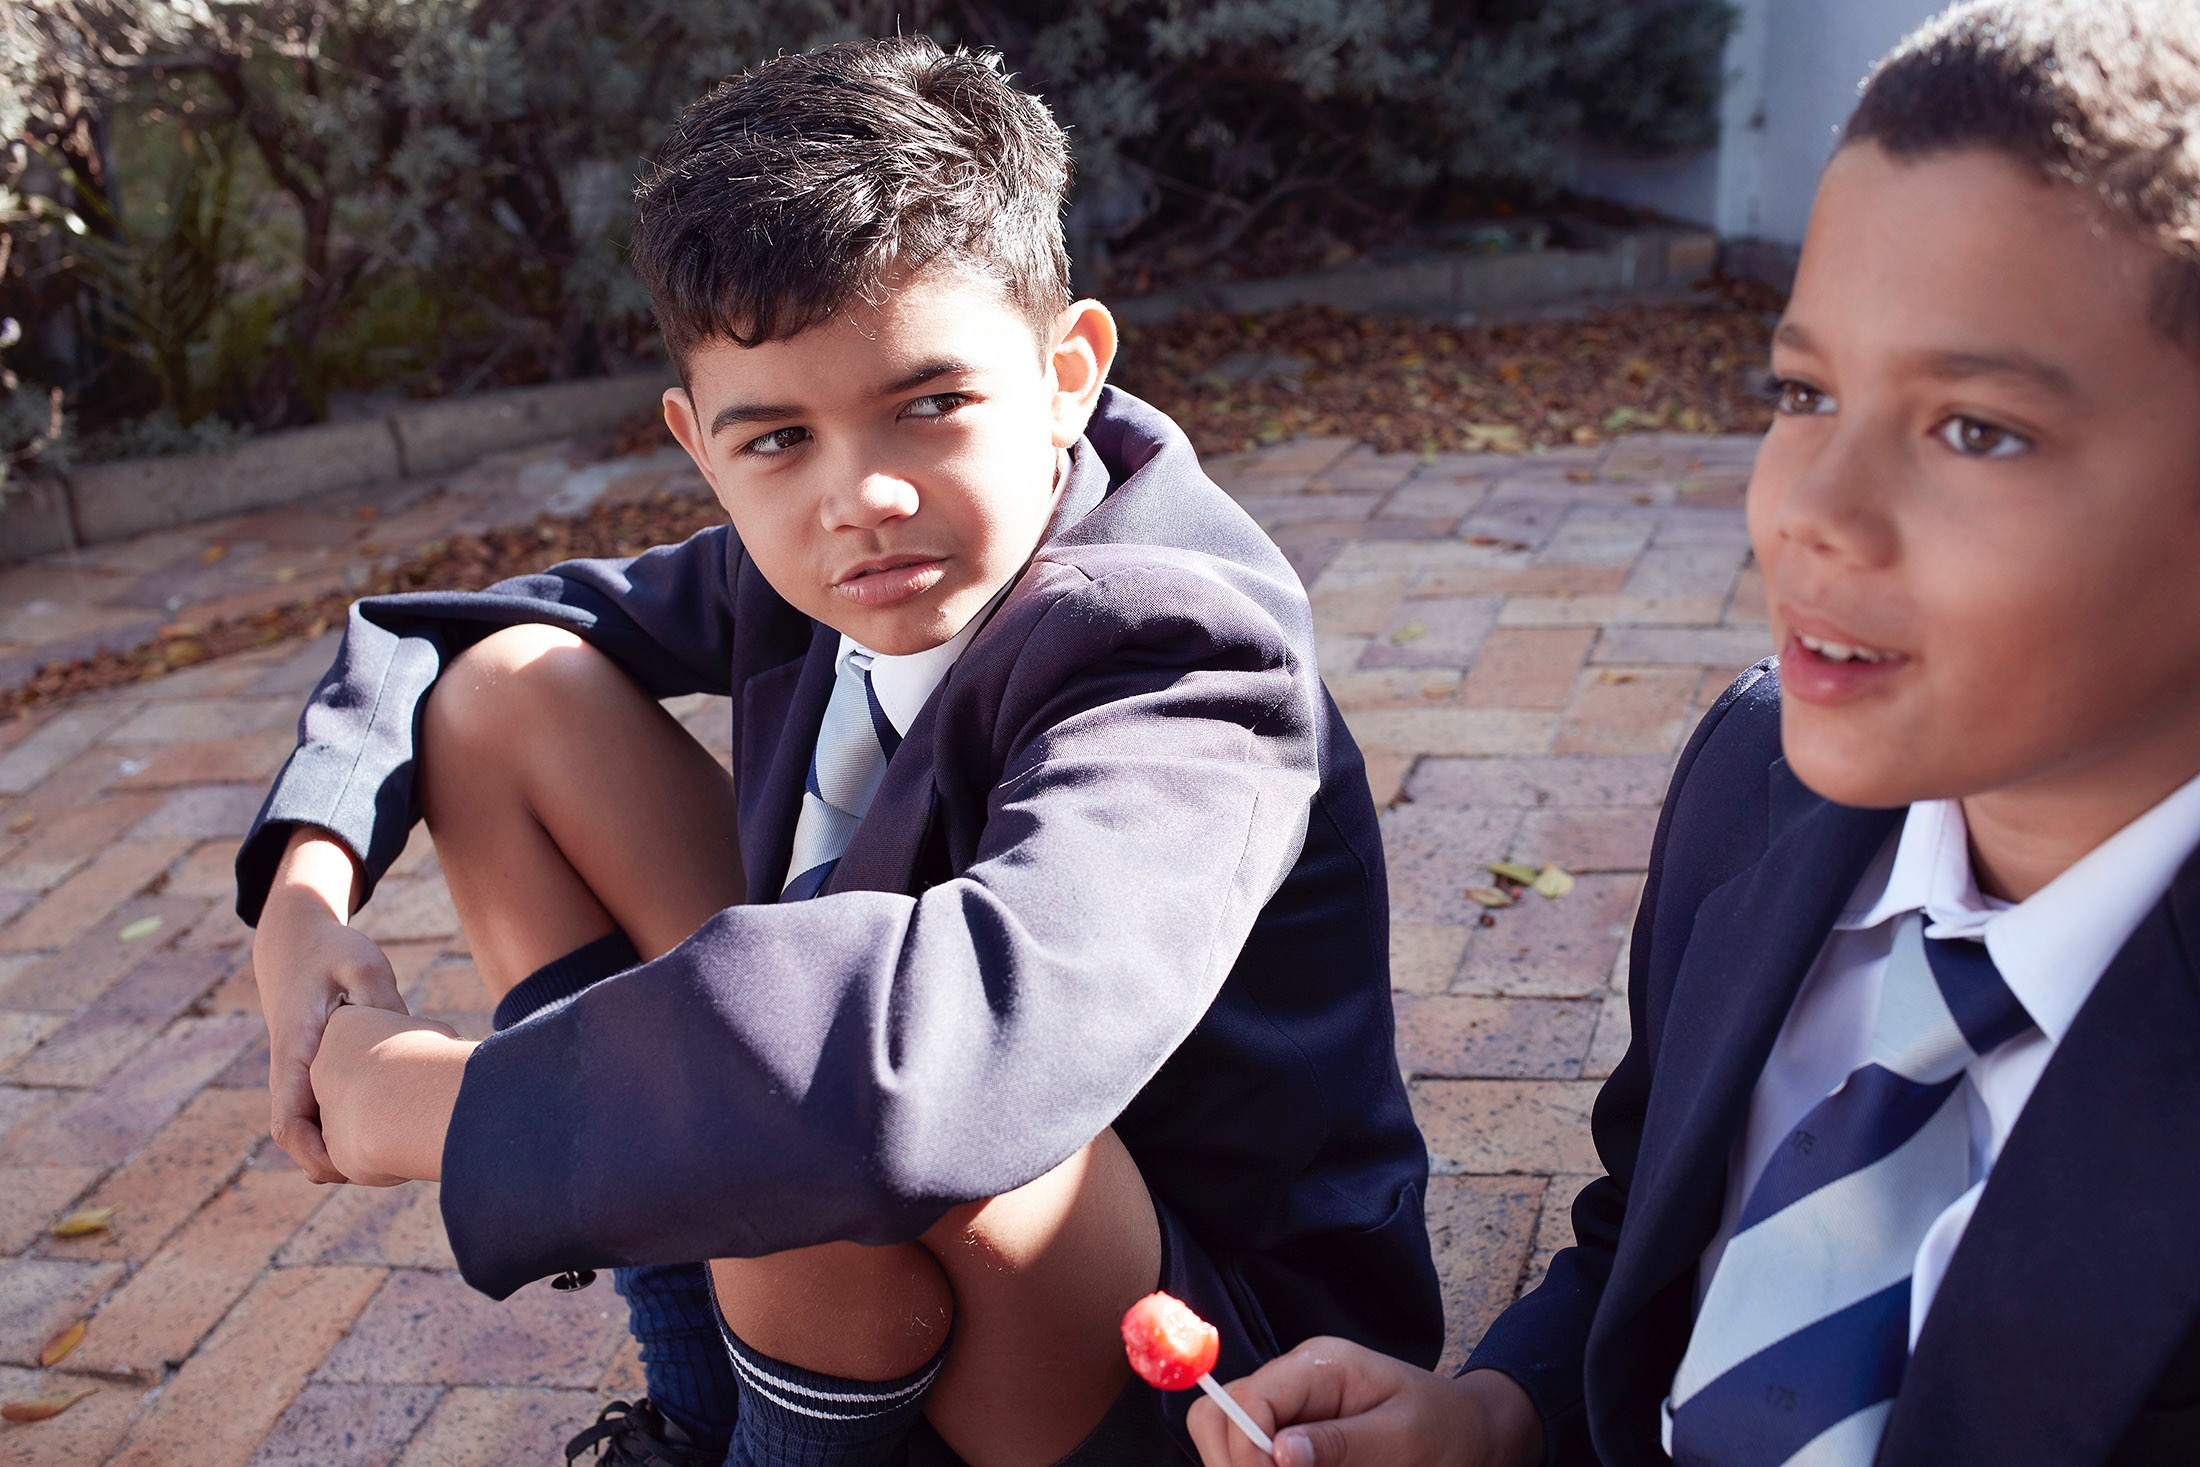 photo photography photographer school uniform education boy boys friends